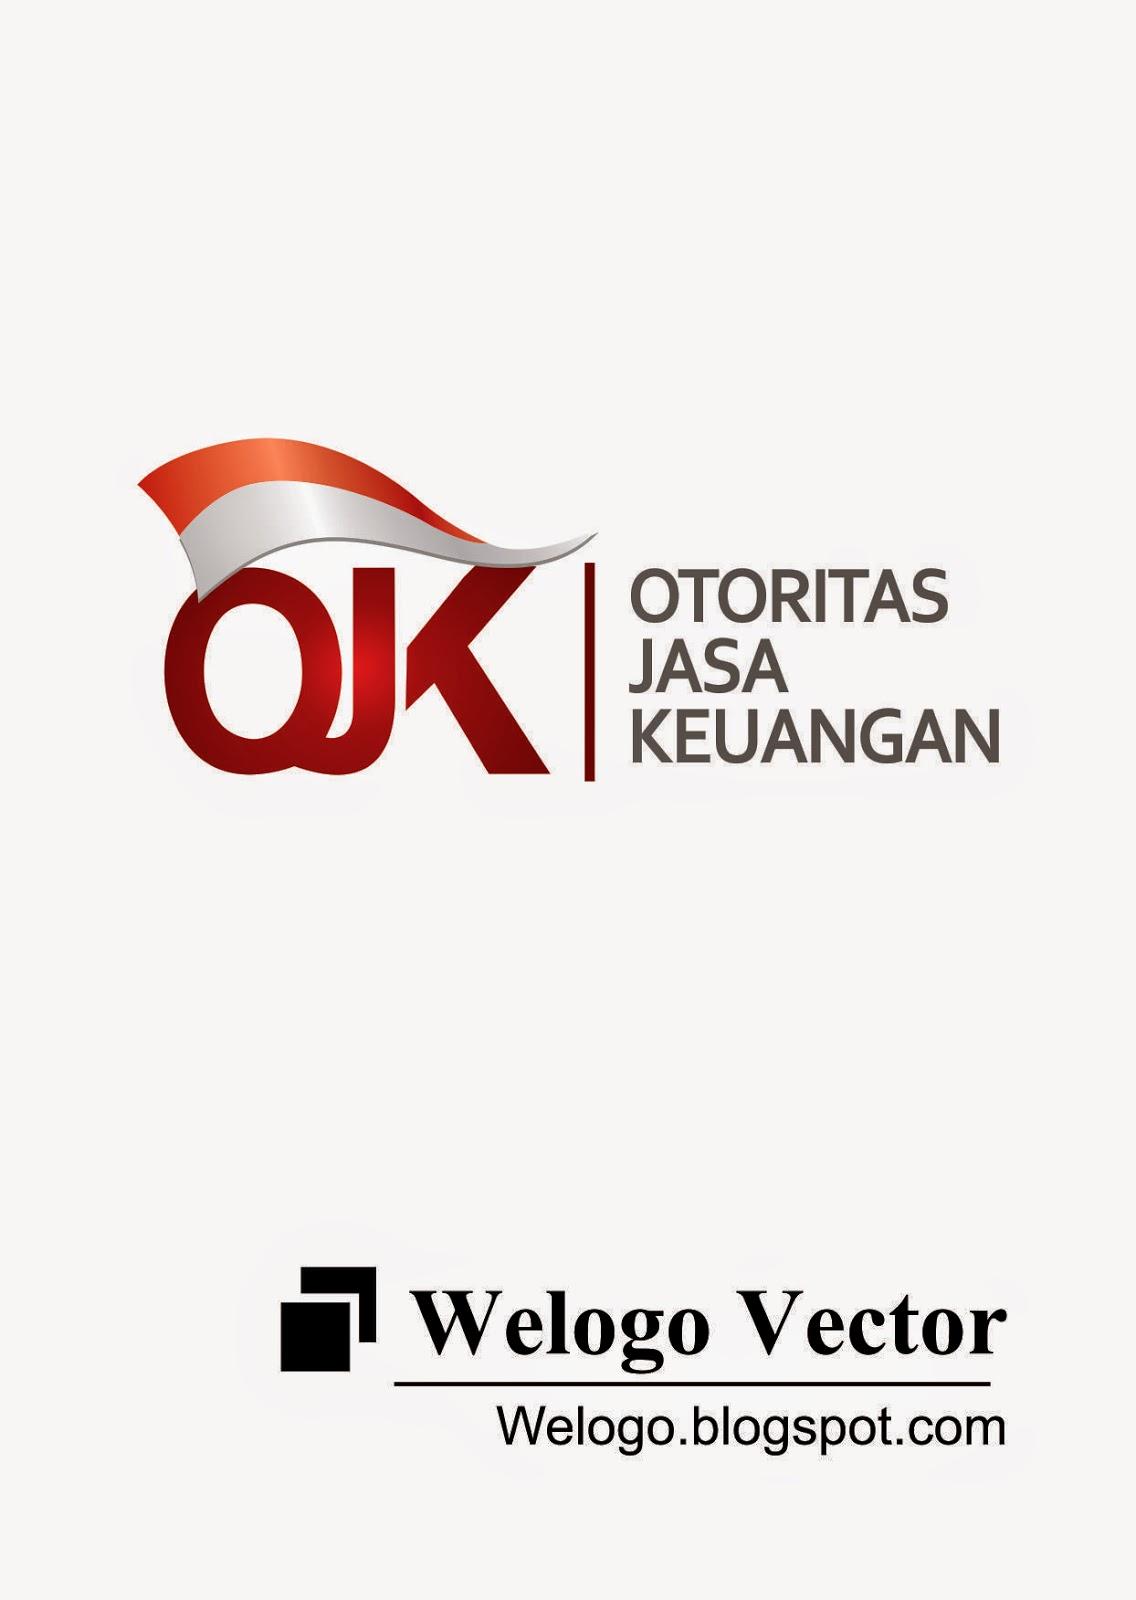 ojk logo otoritas jasa keuangan vector png cdr ai